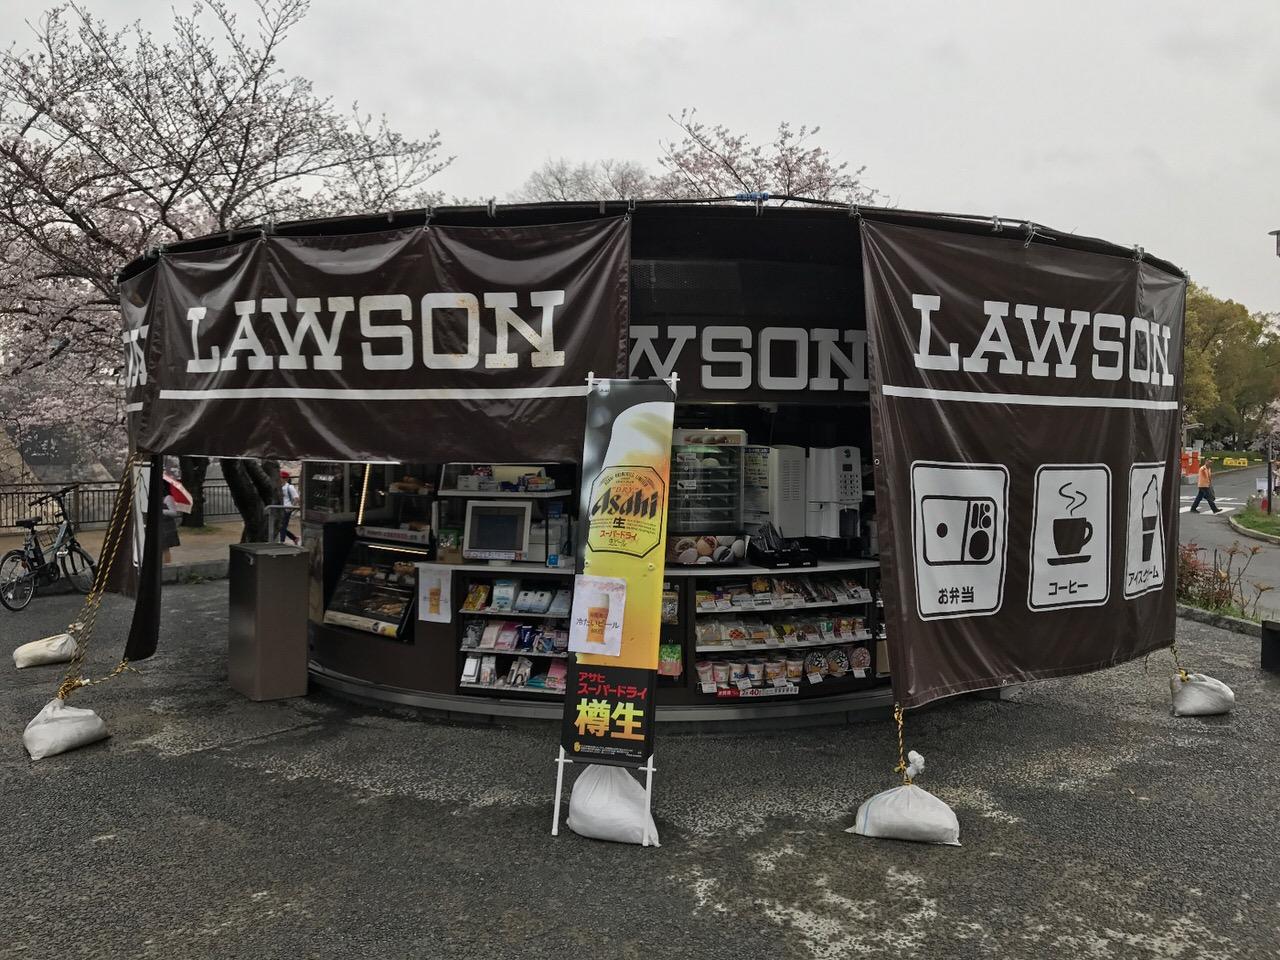 Lawson osaka castle 9318